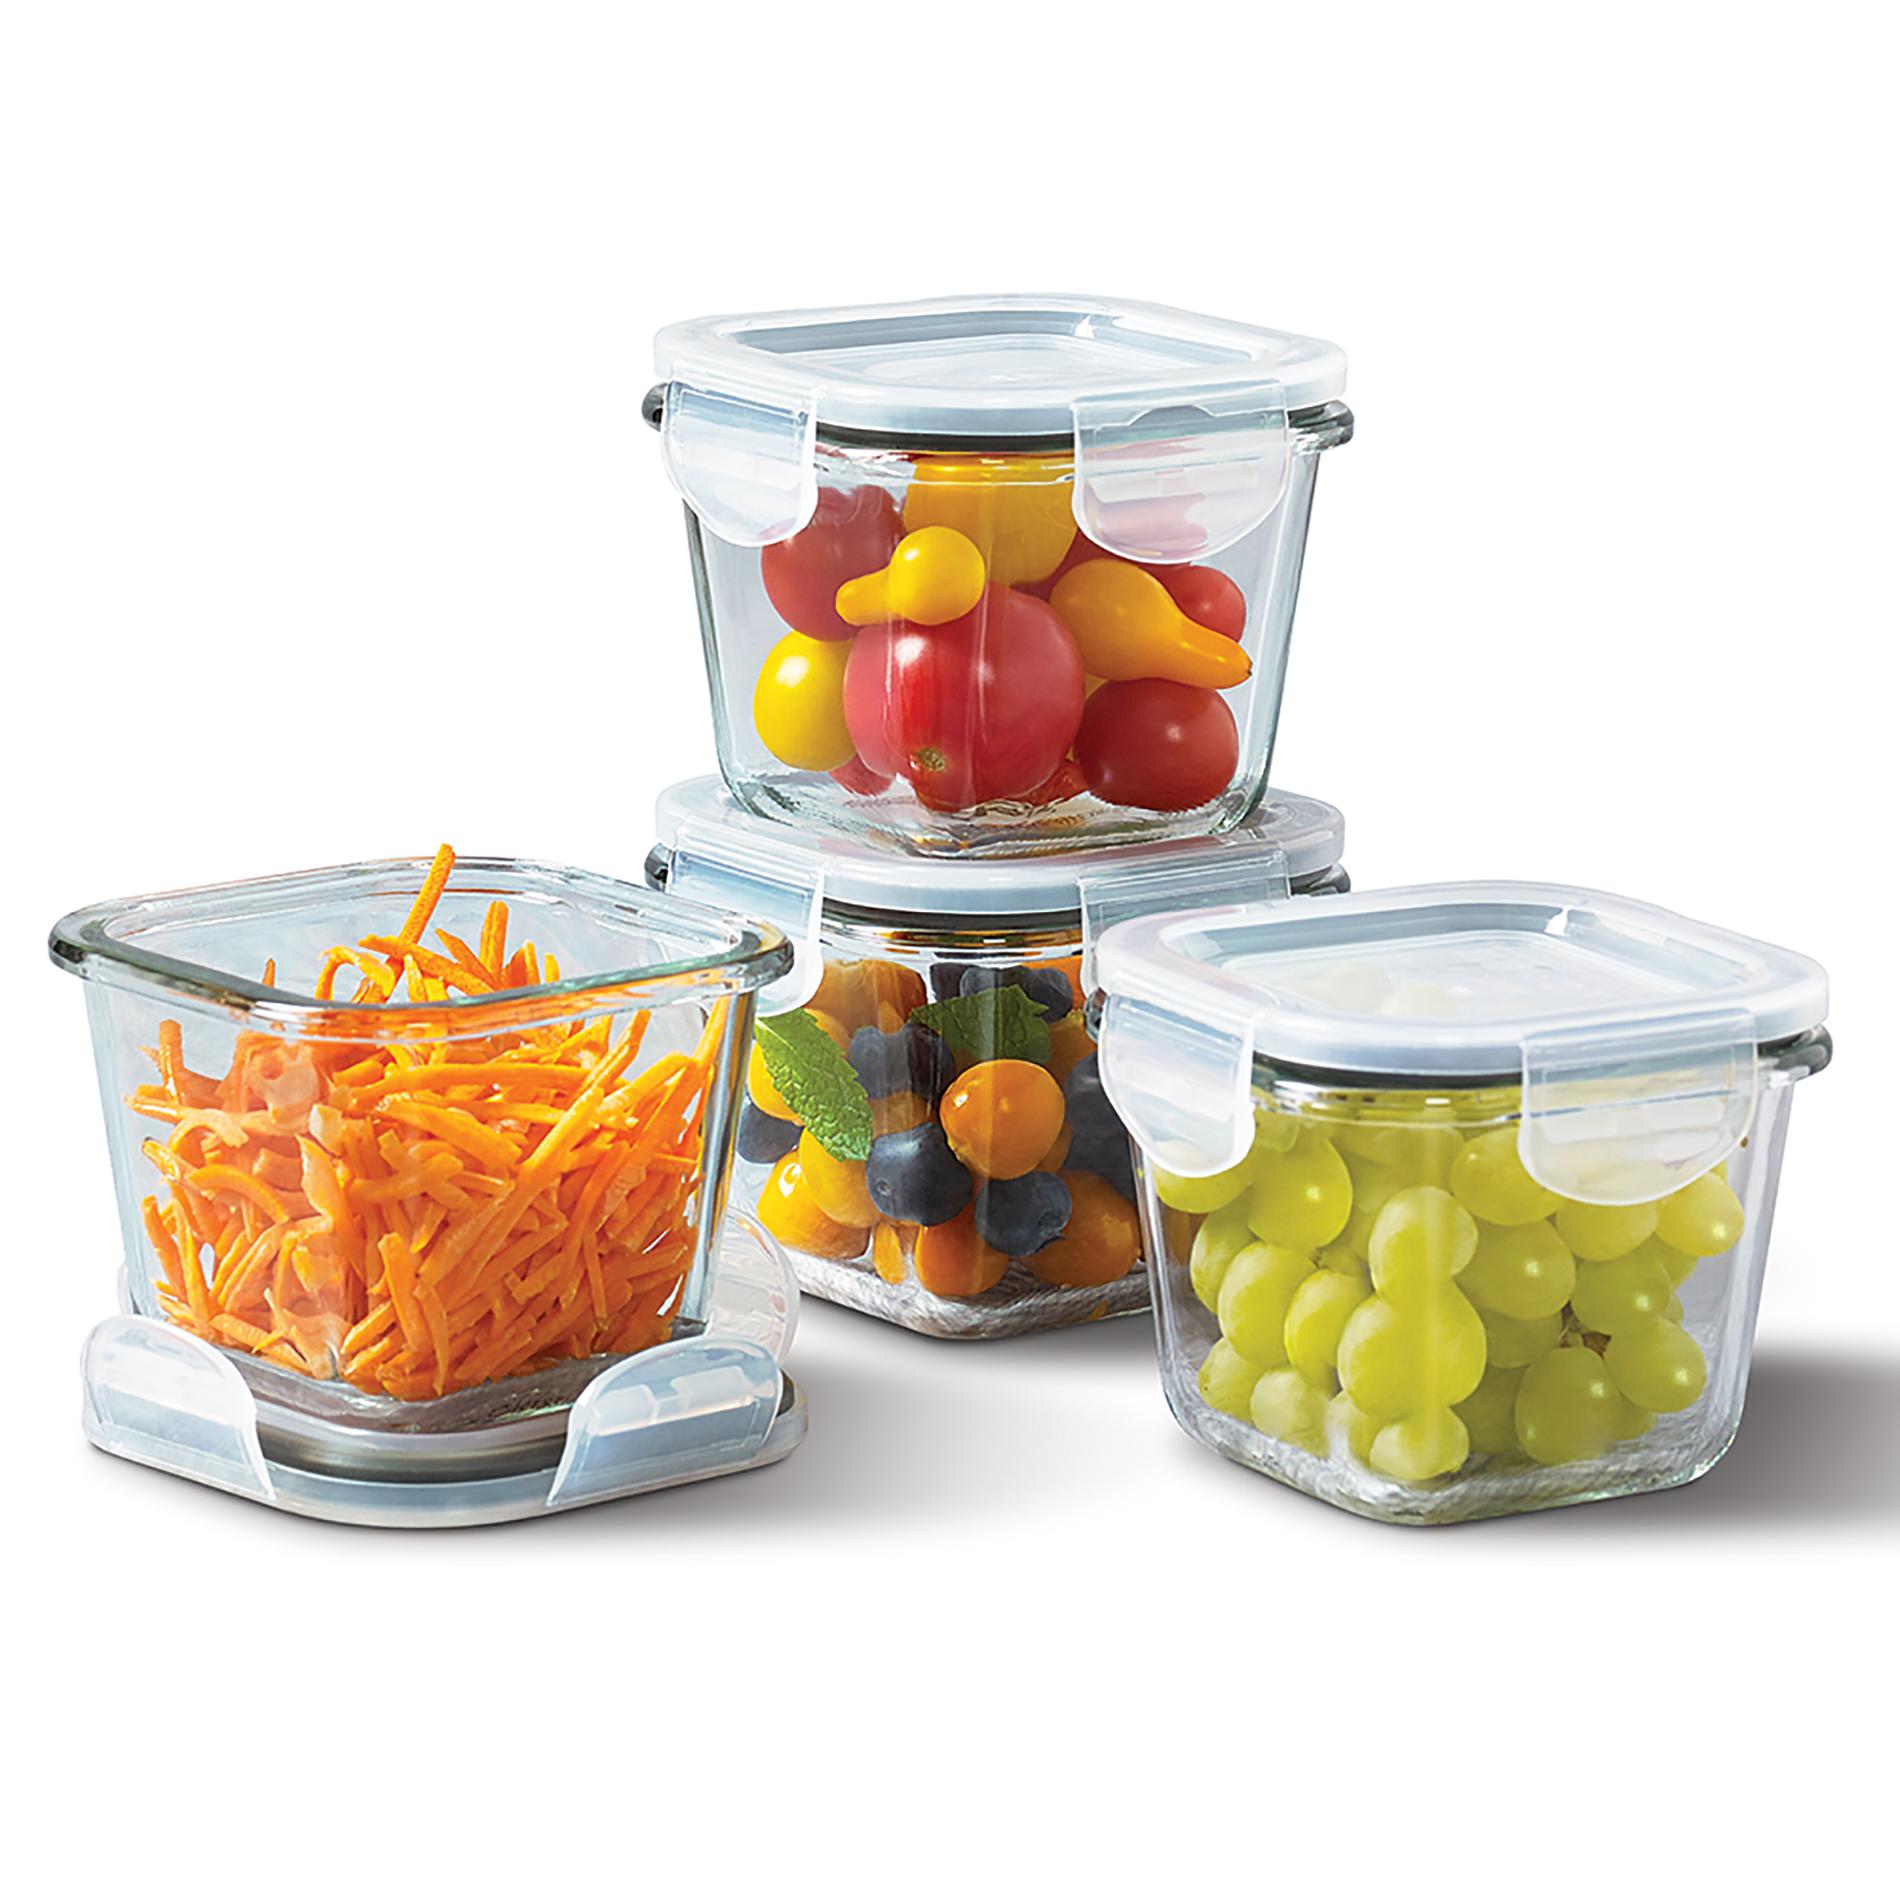 Tabletops Unlimited 8pc. Mini Square Glass Storage